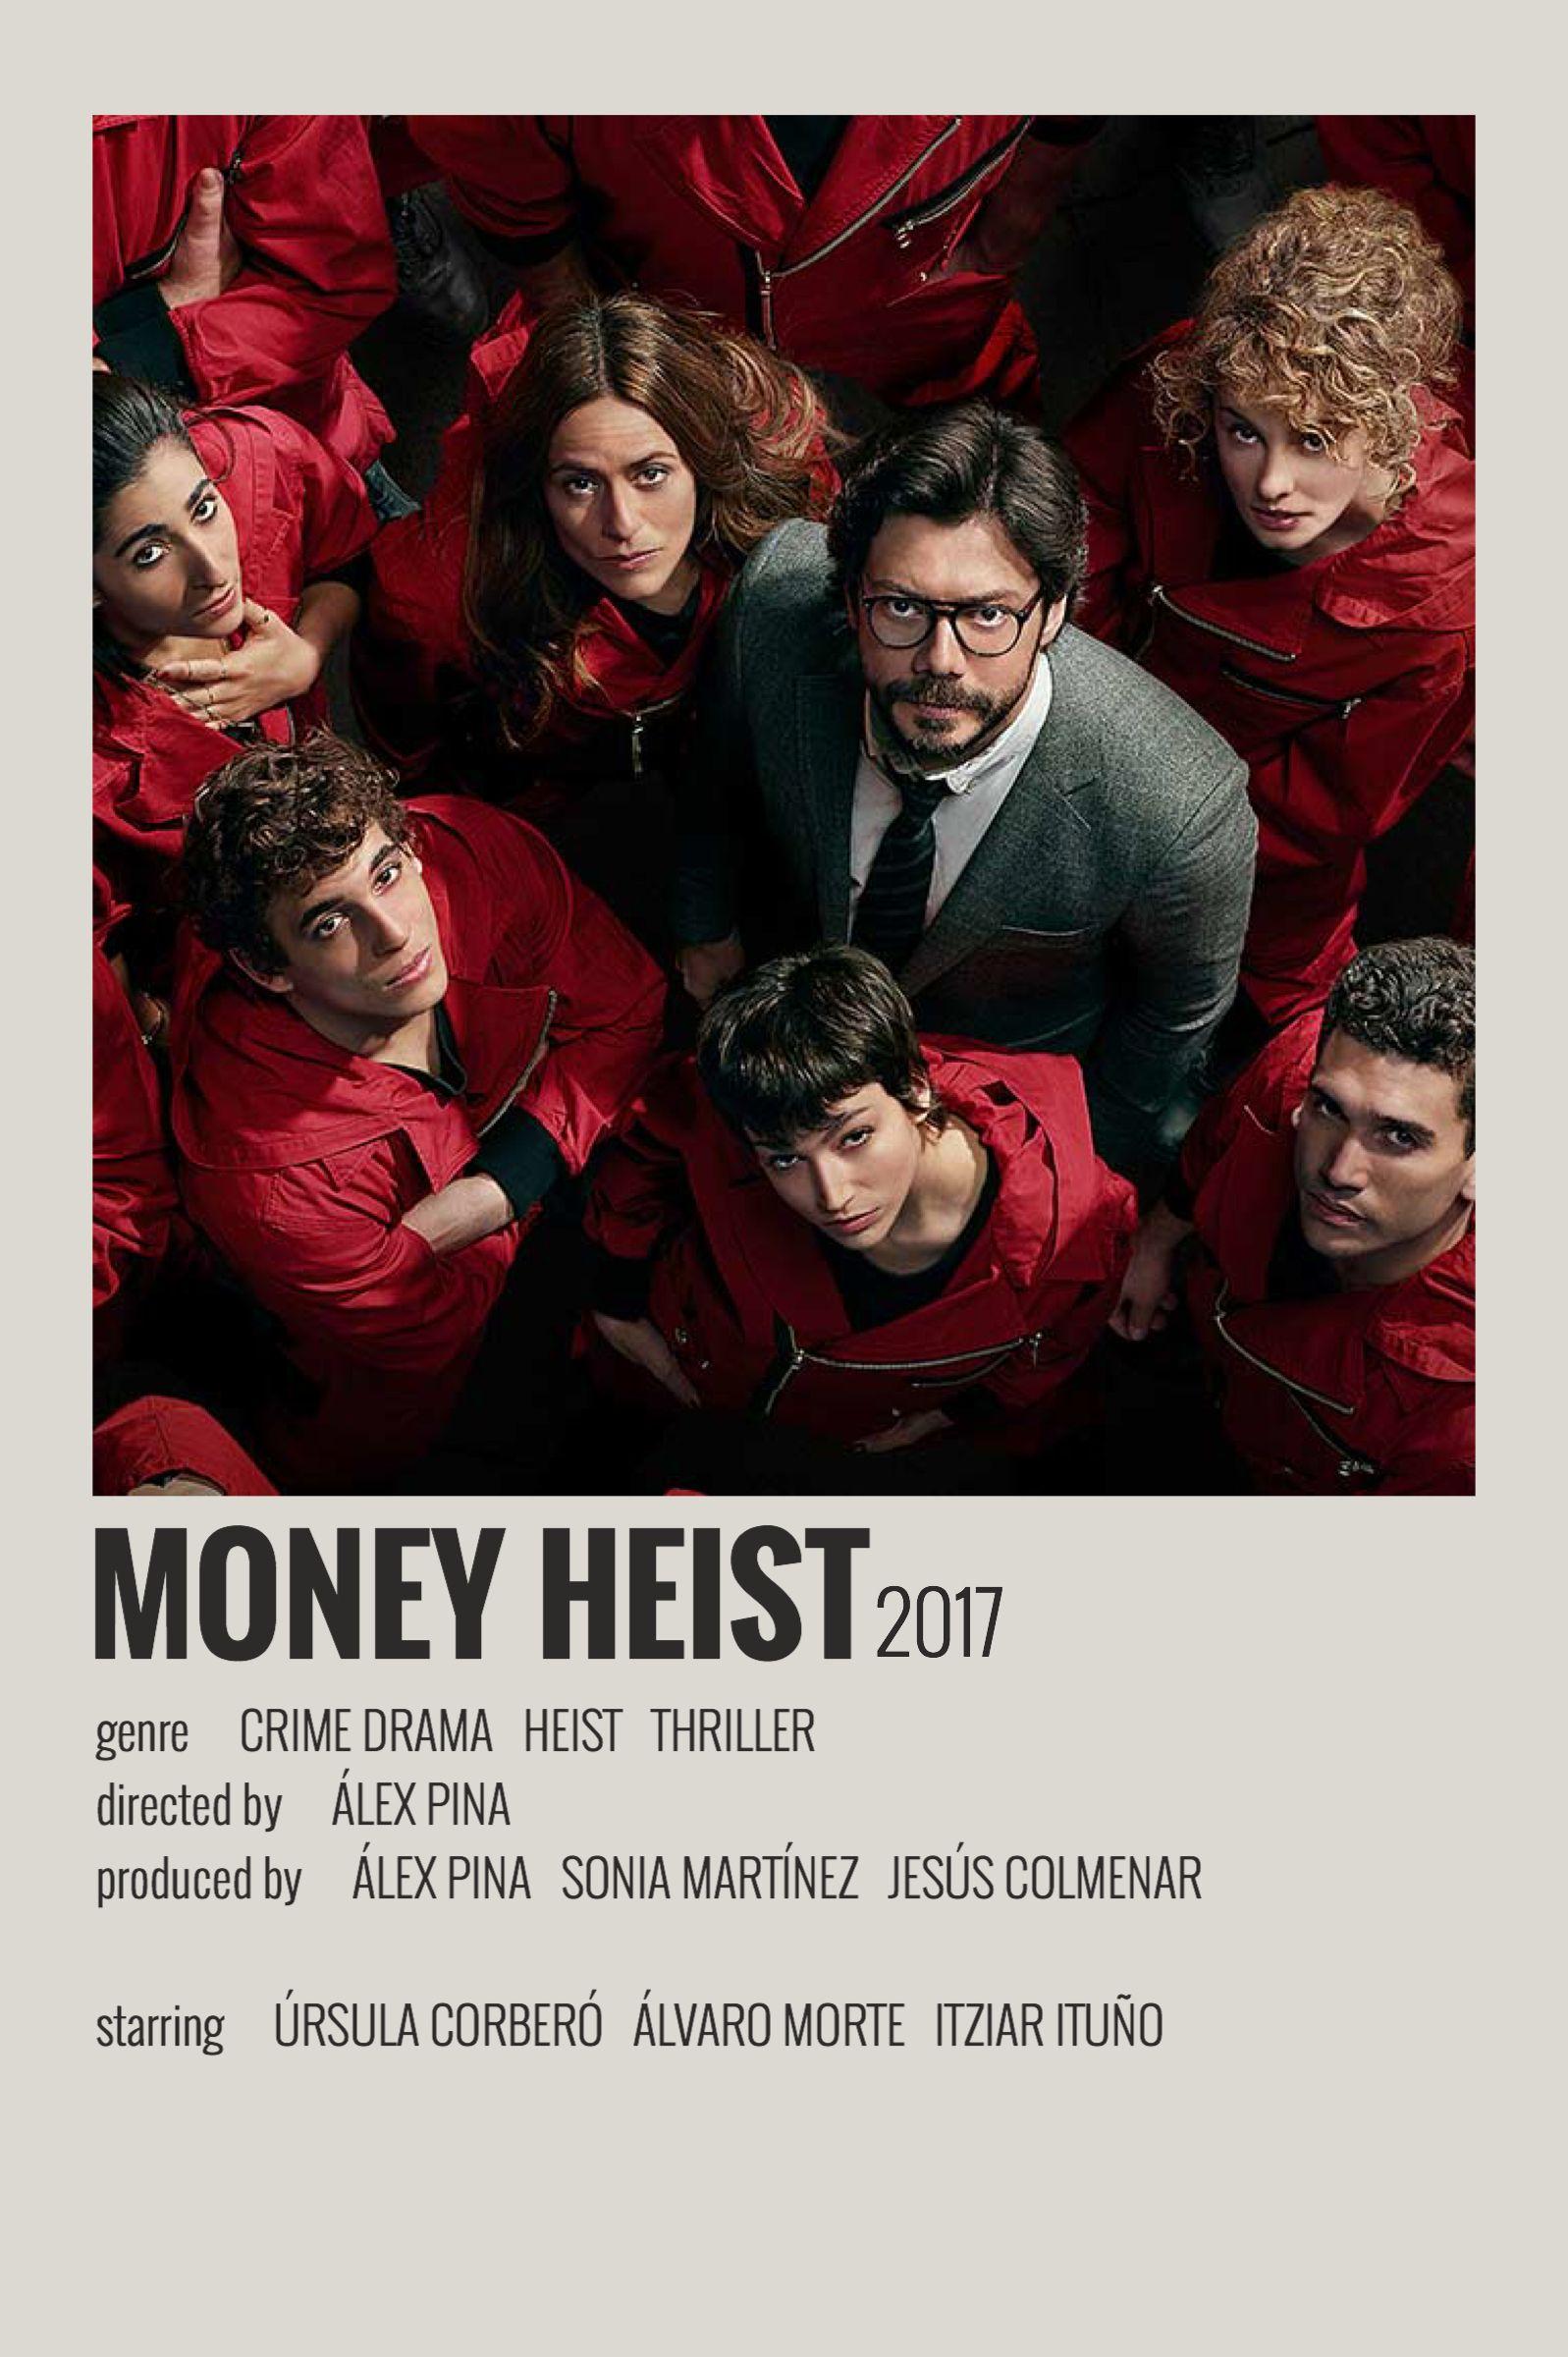 Alternative Minimalist Movie/Show Polaroid Poster - Money Heist